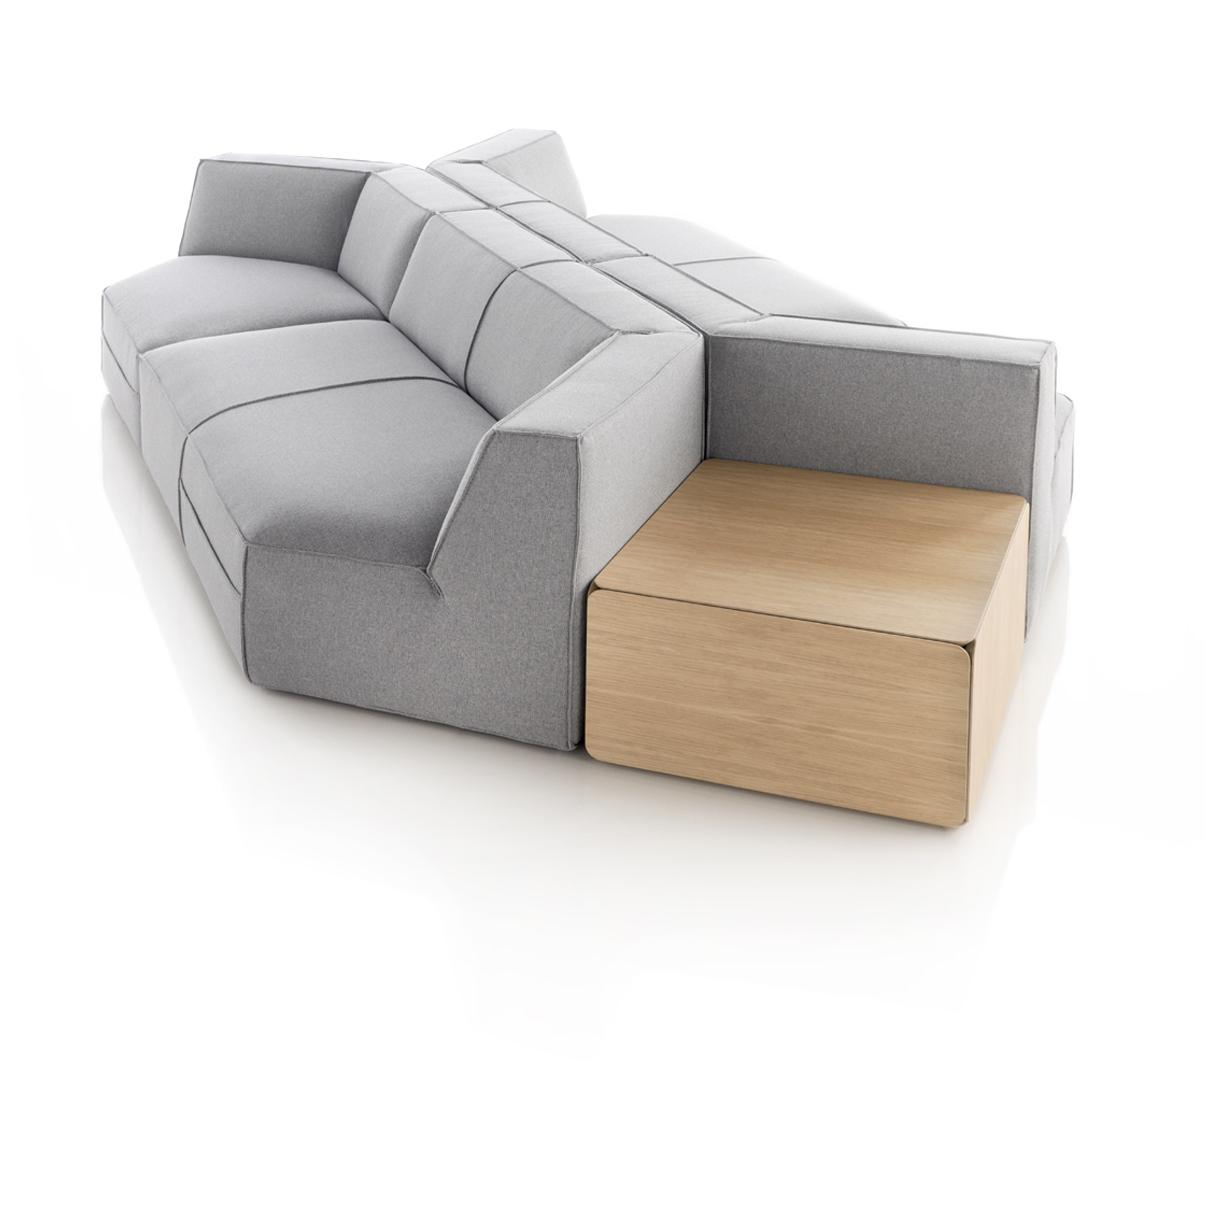 Modernūs ofiso sofos moduliai sum